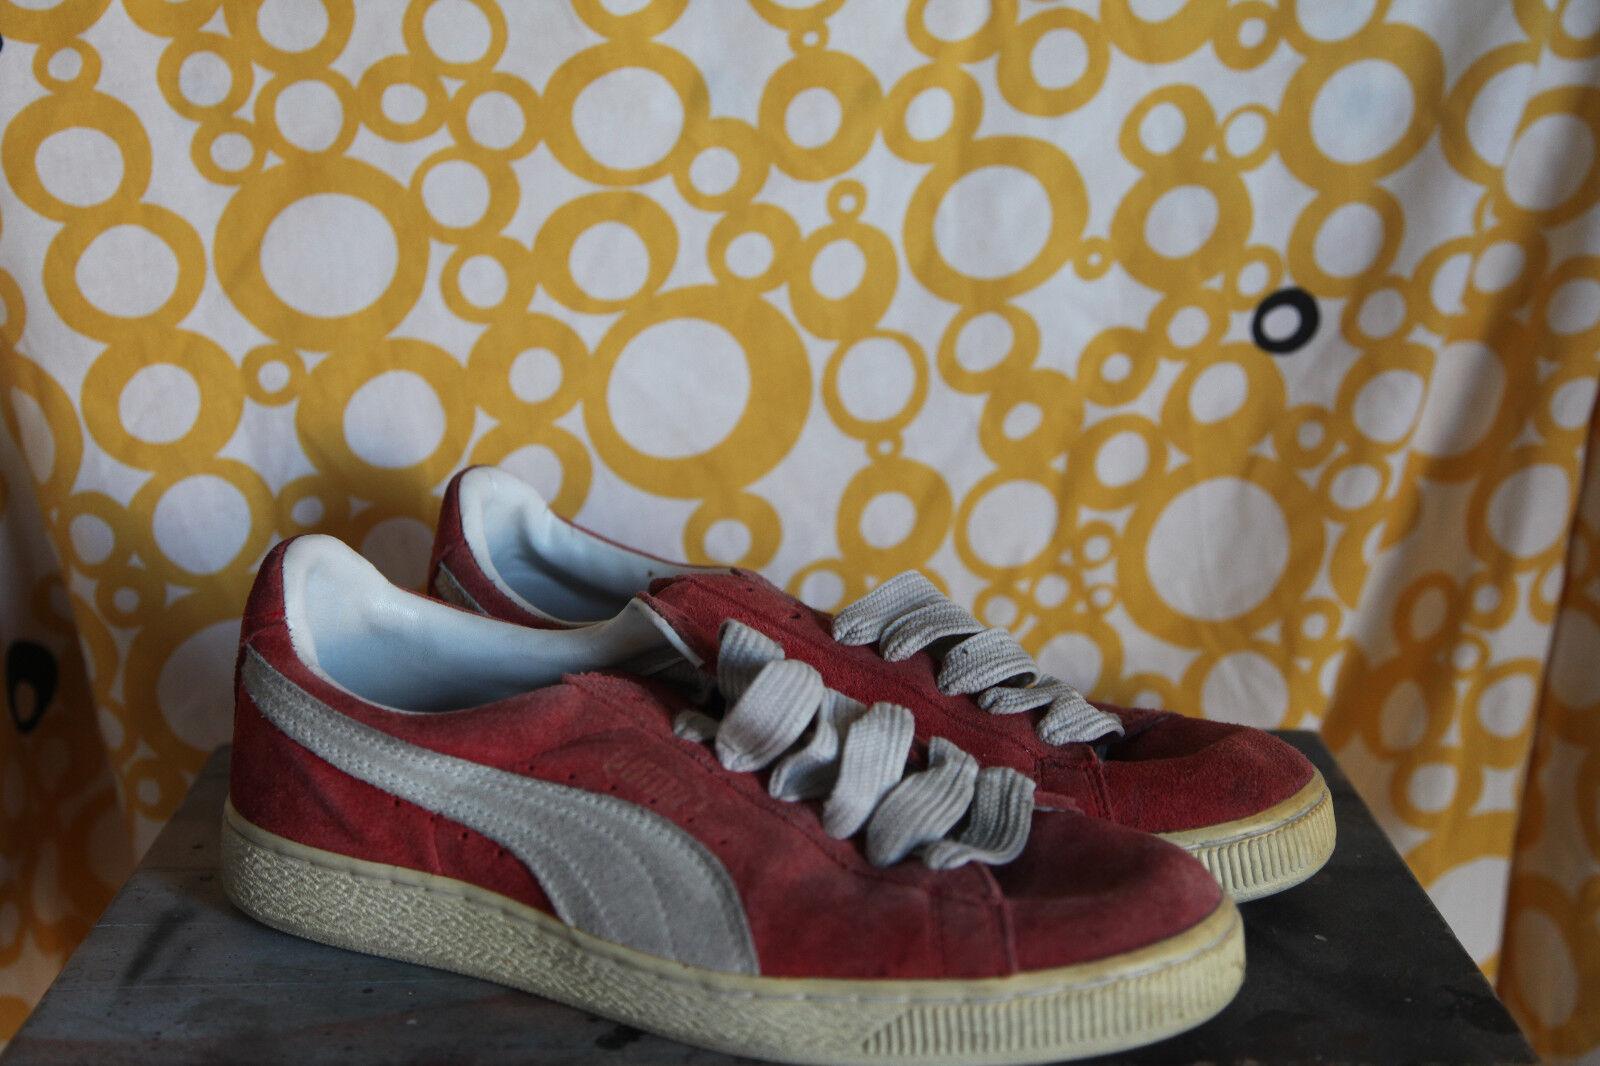 Puma Basket Red Sz US 10 early 90s